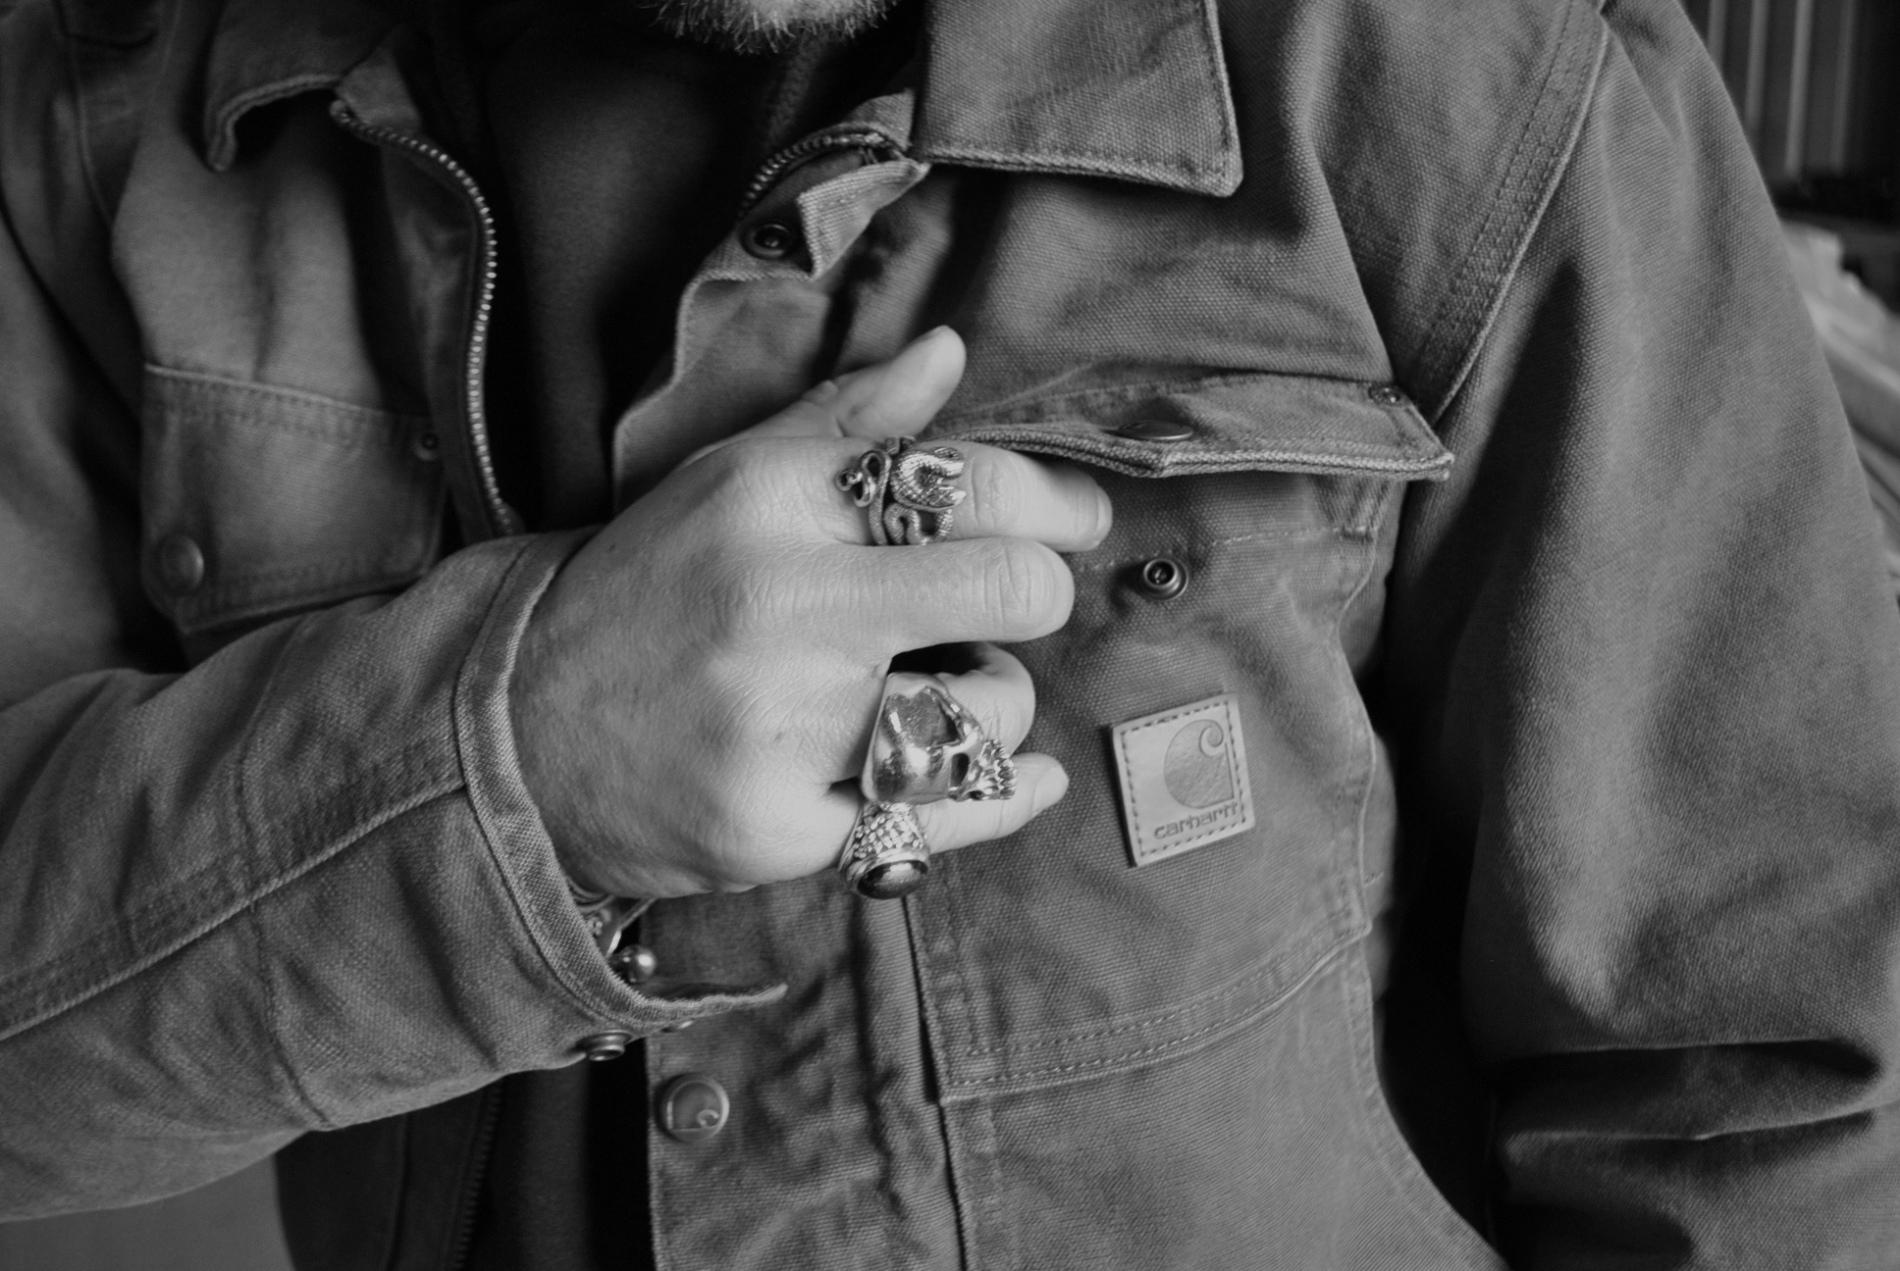 carhartt-jacket-detail-3-bw